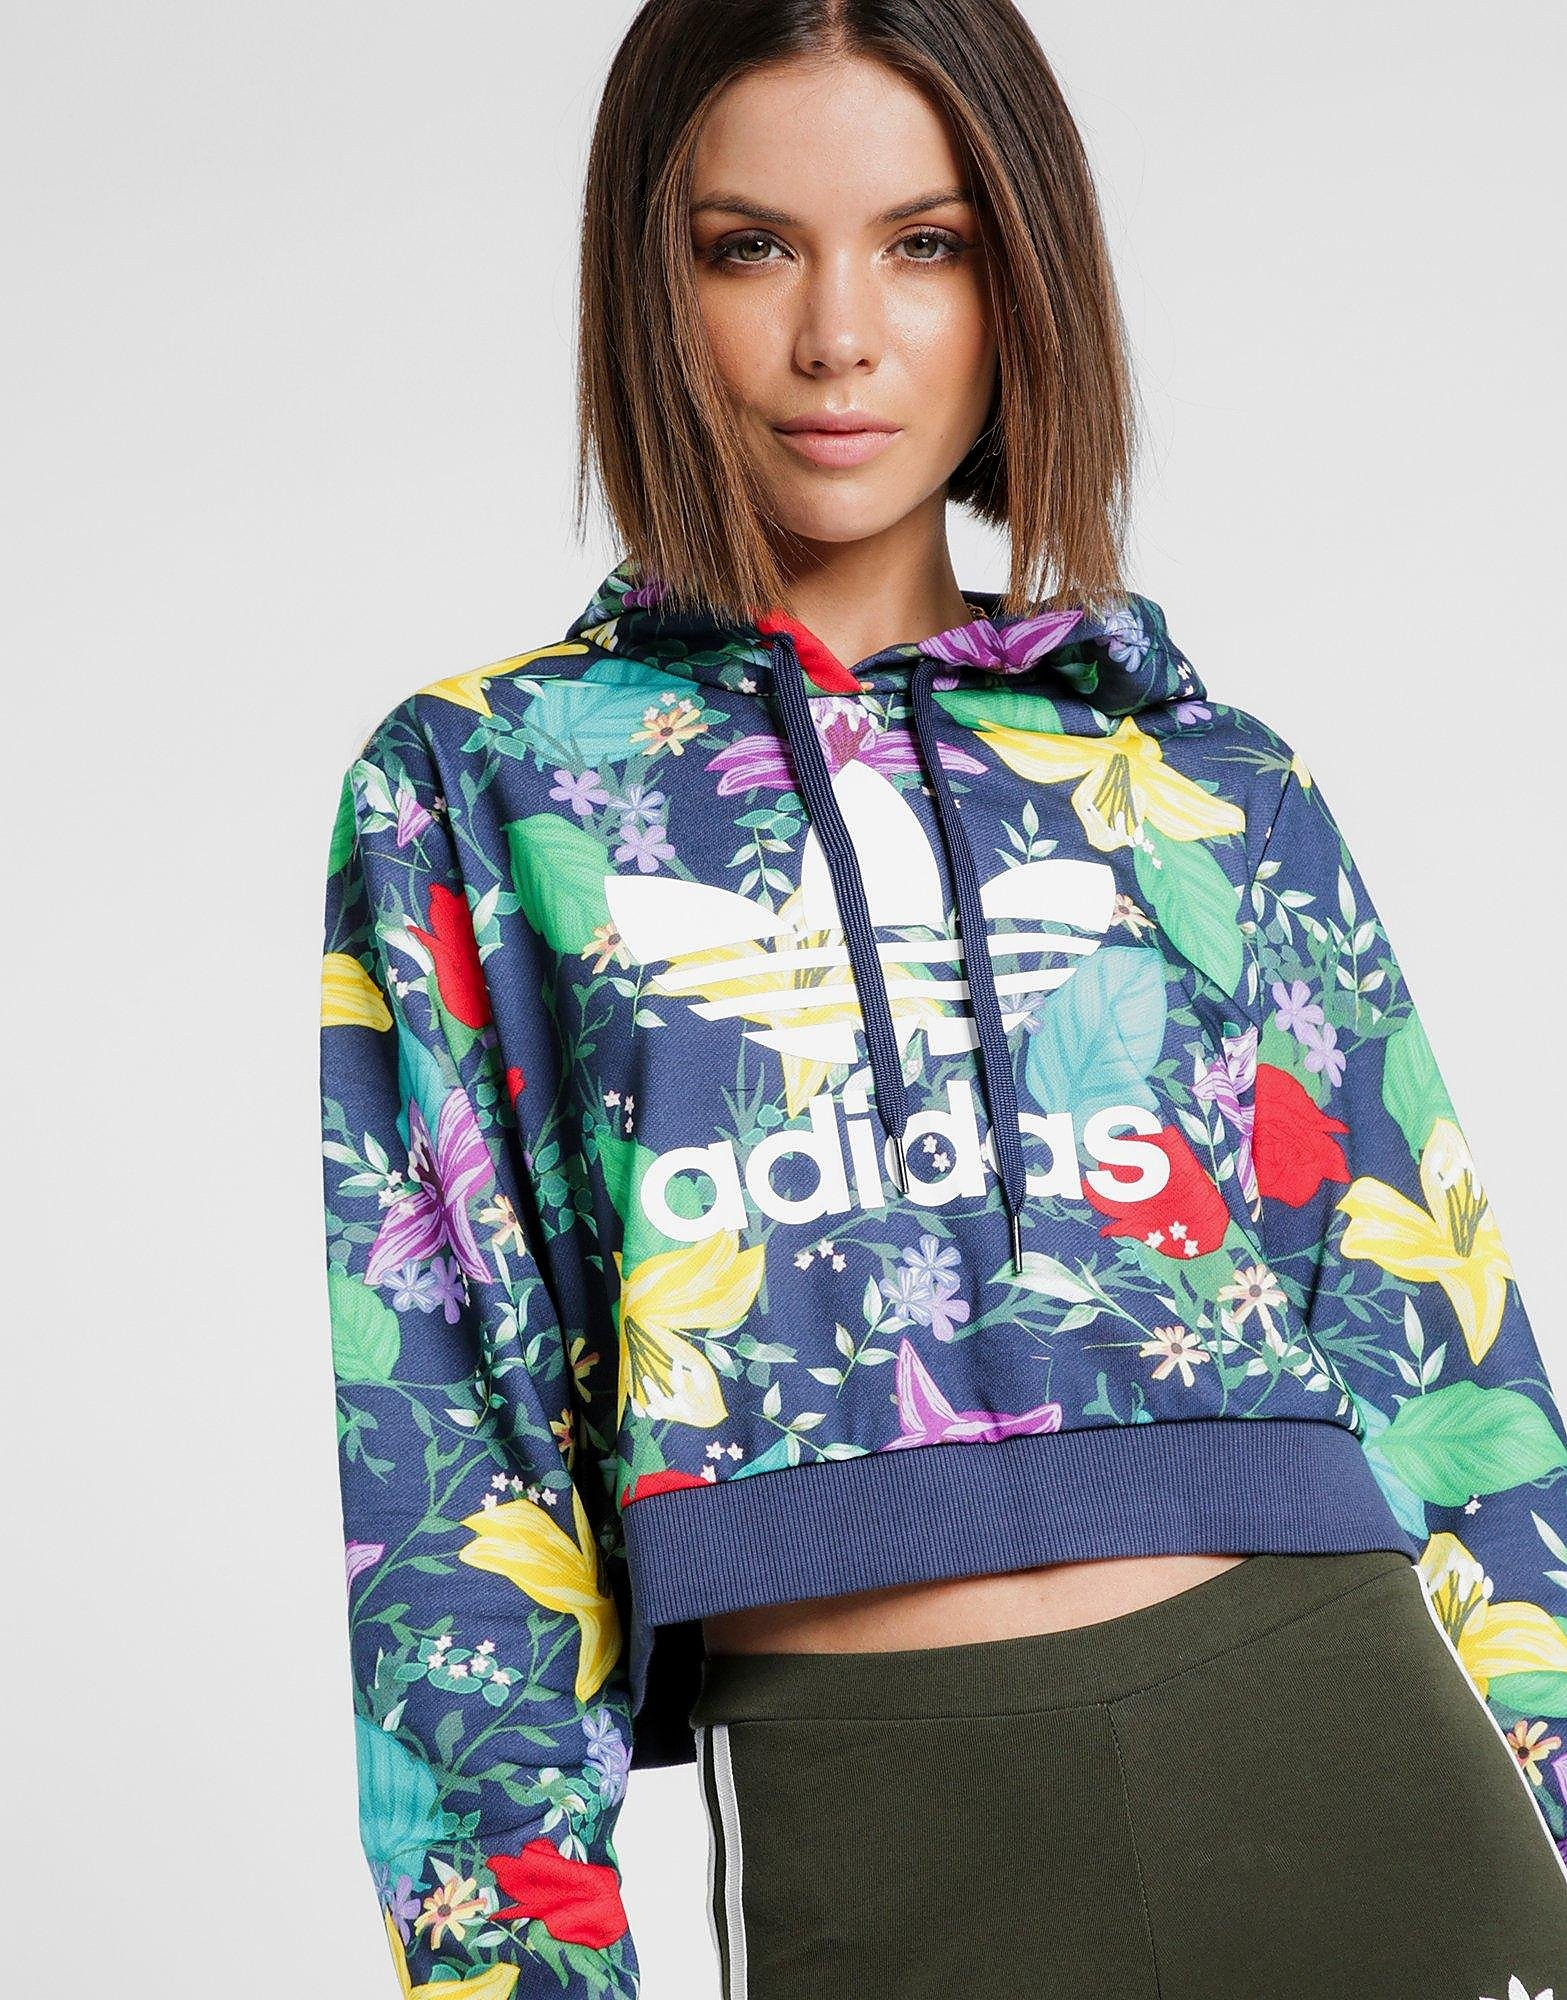 Adidas Originals Womens Clothing Women Jd Sports